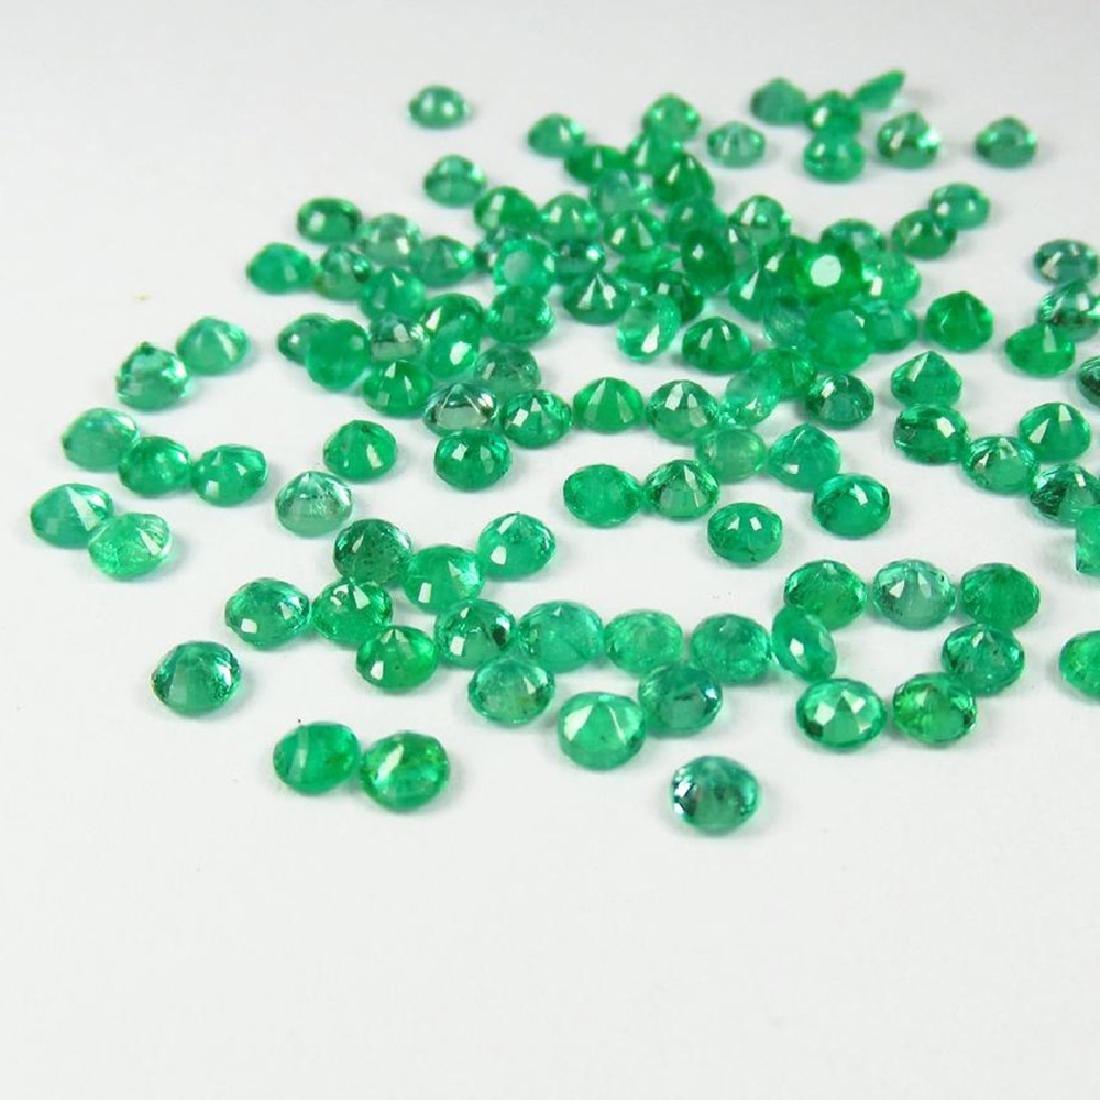 9.67 Ctw Natural 110 Calibrate Emerald 3.0 mm Round